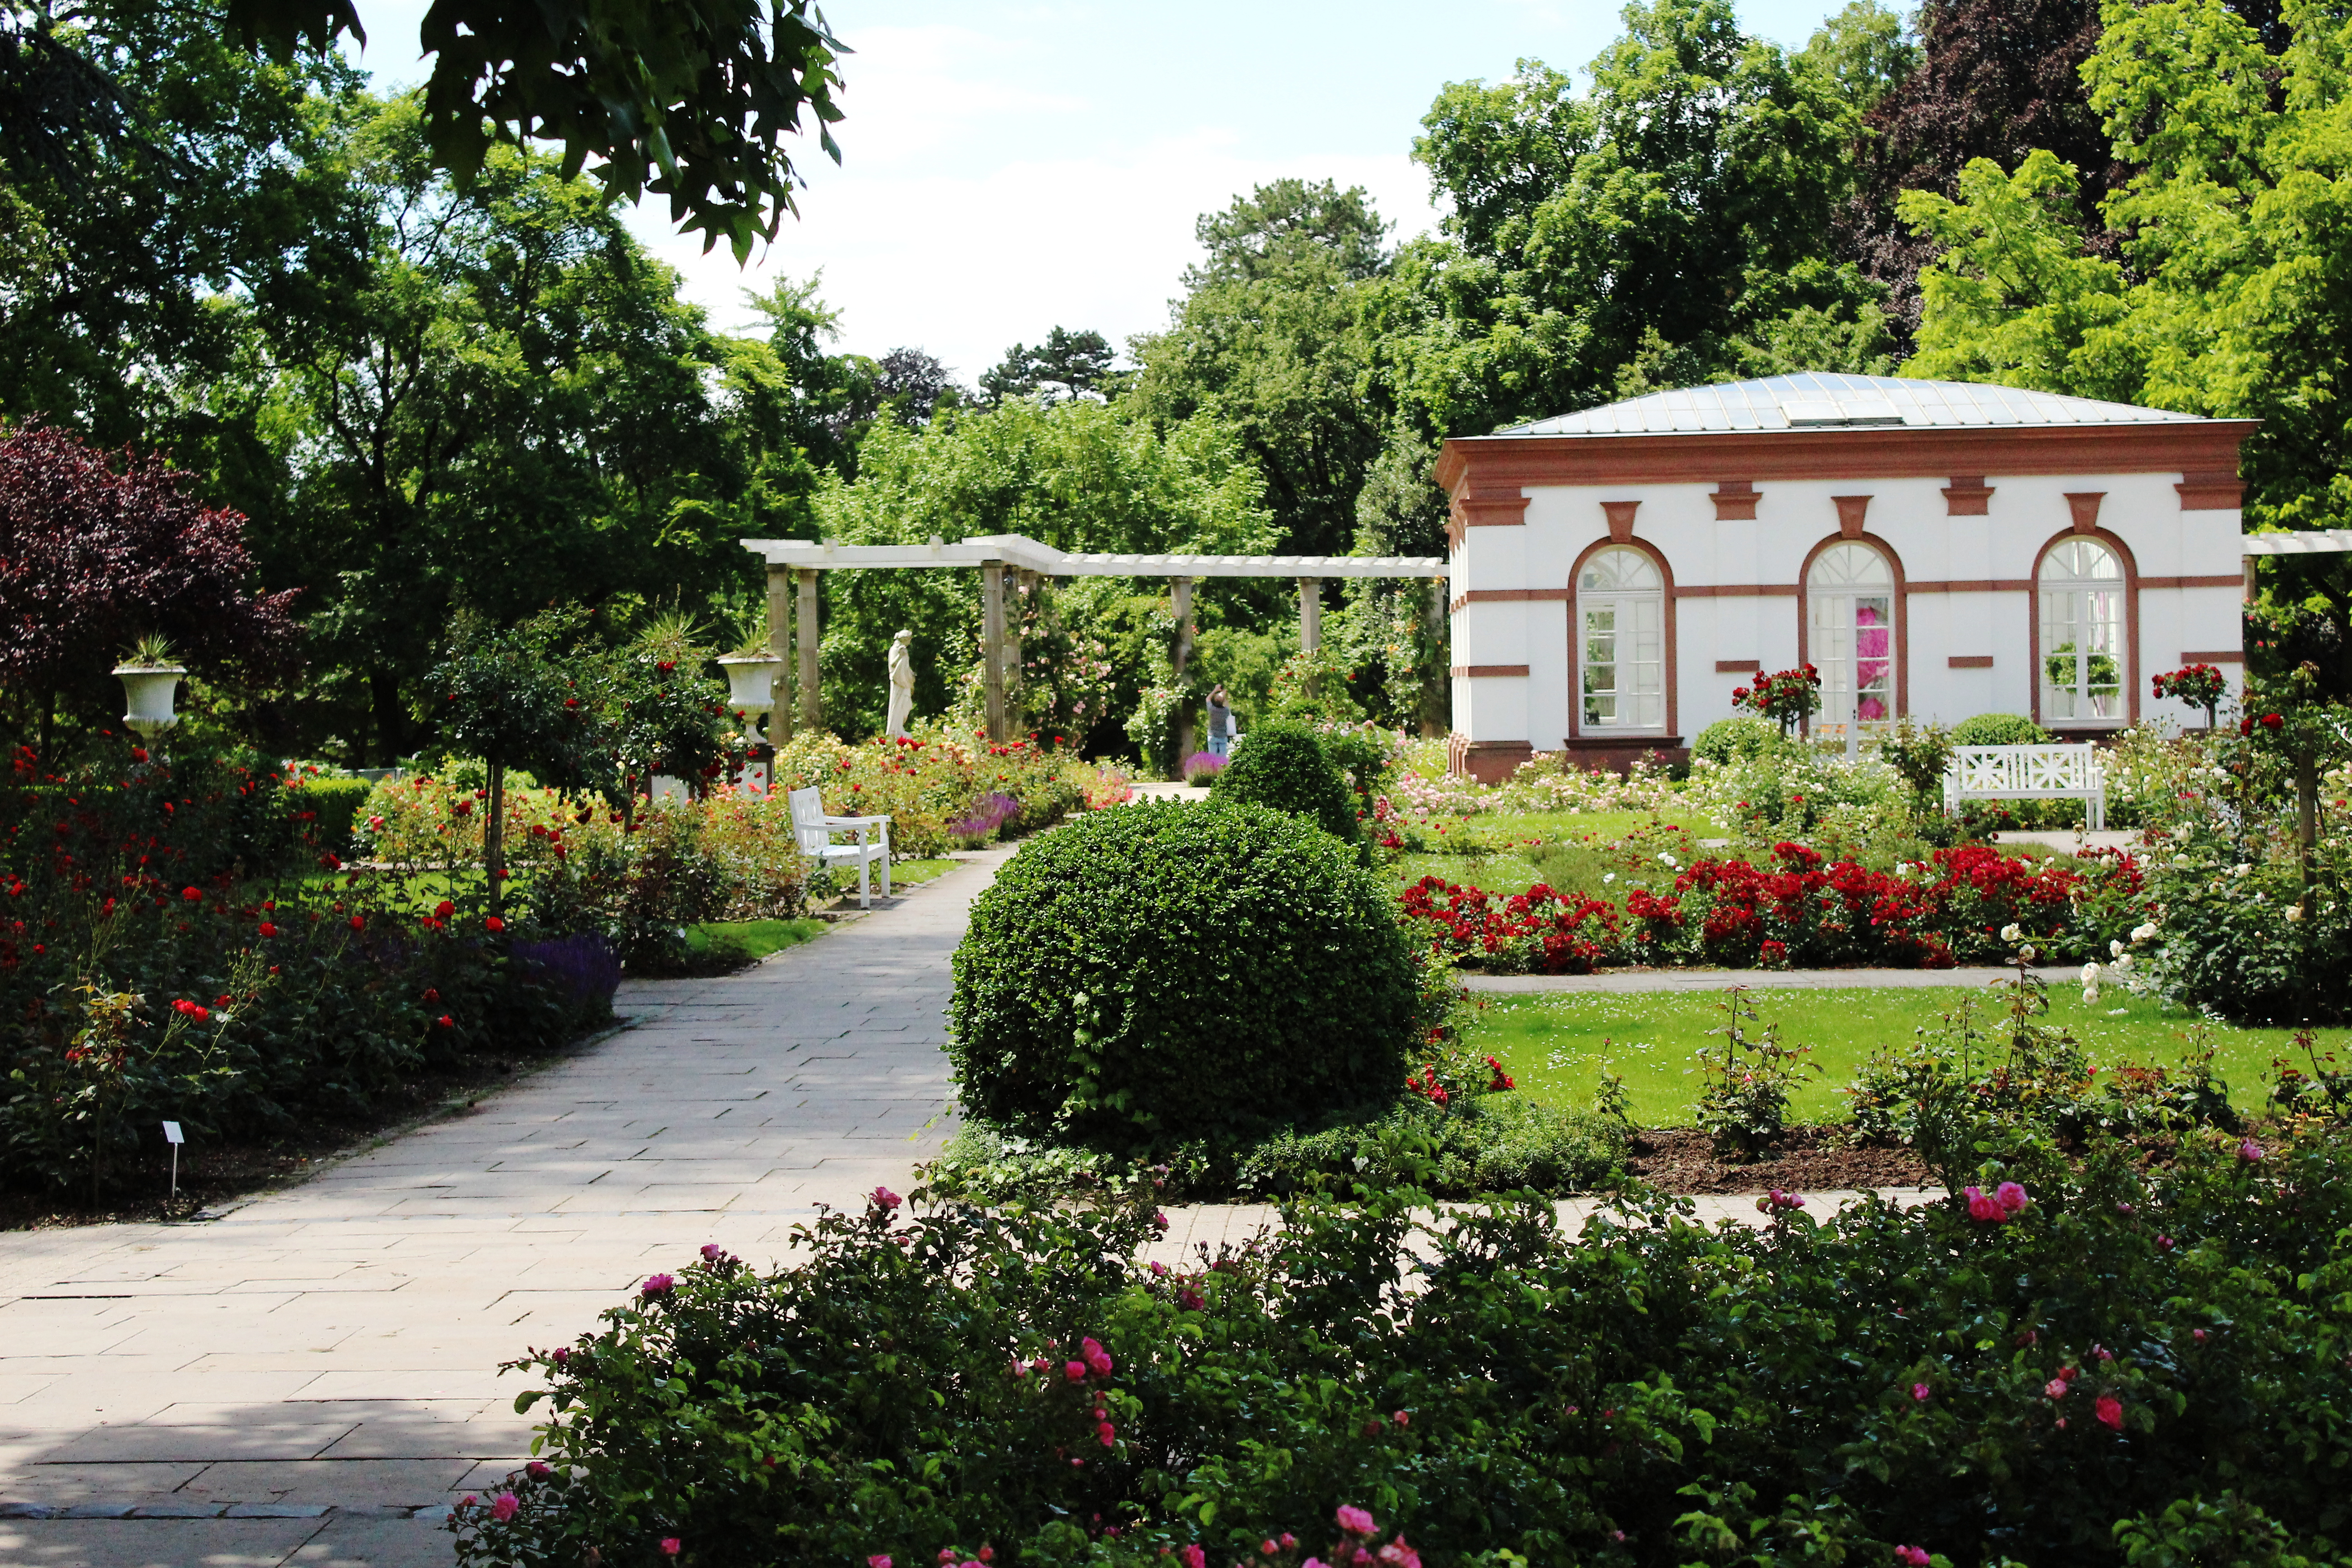 Palmengarten, a botanical garden in Frankfurt.